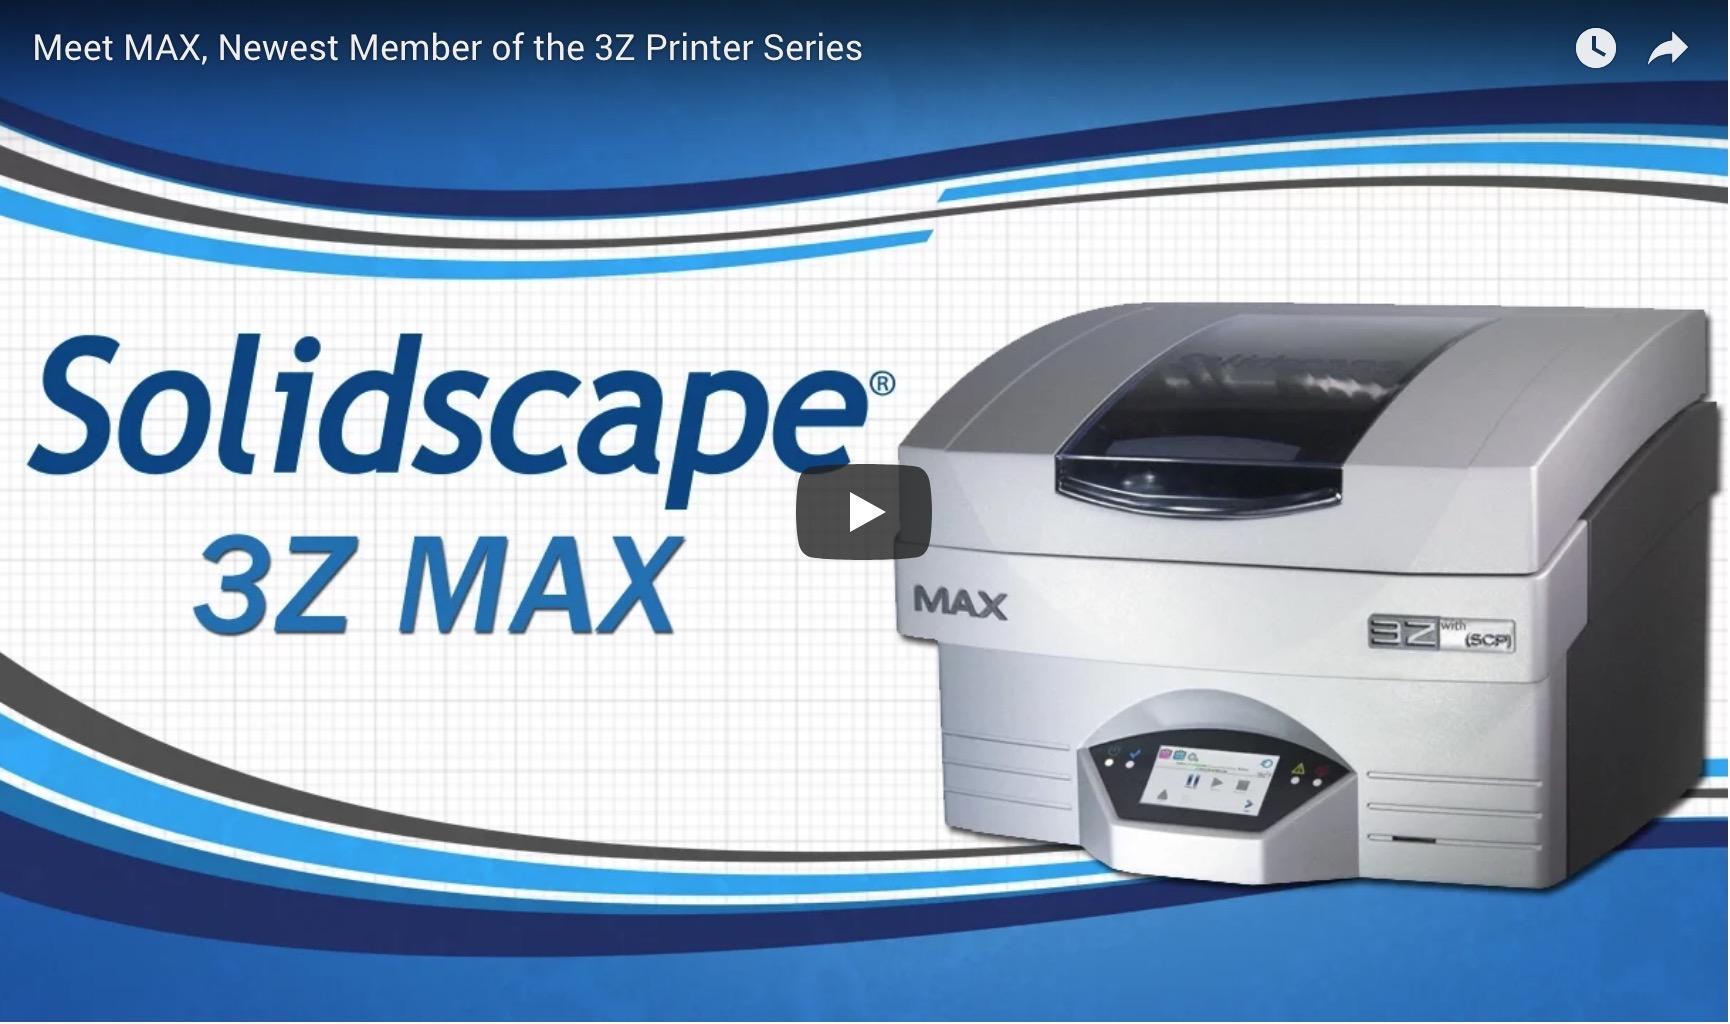 Meet MAX, Newest Member of the 3Z Printer Series